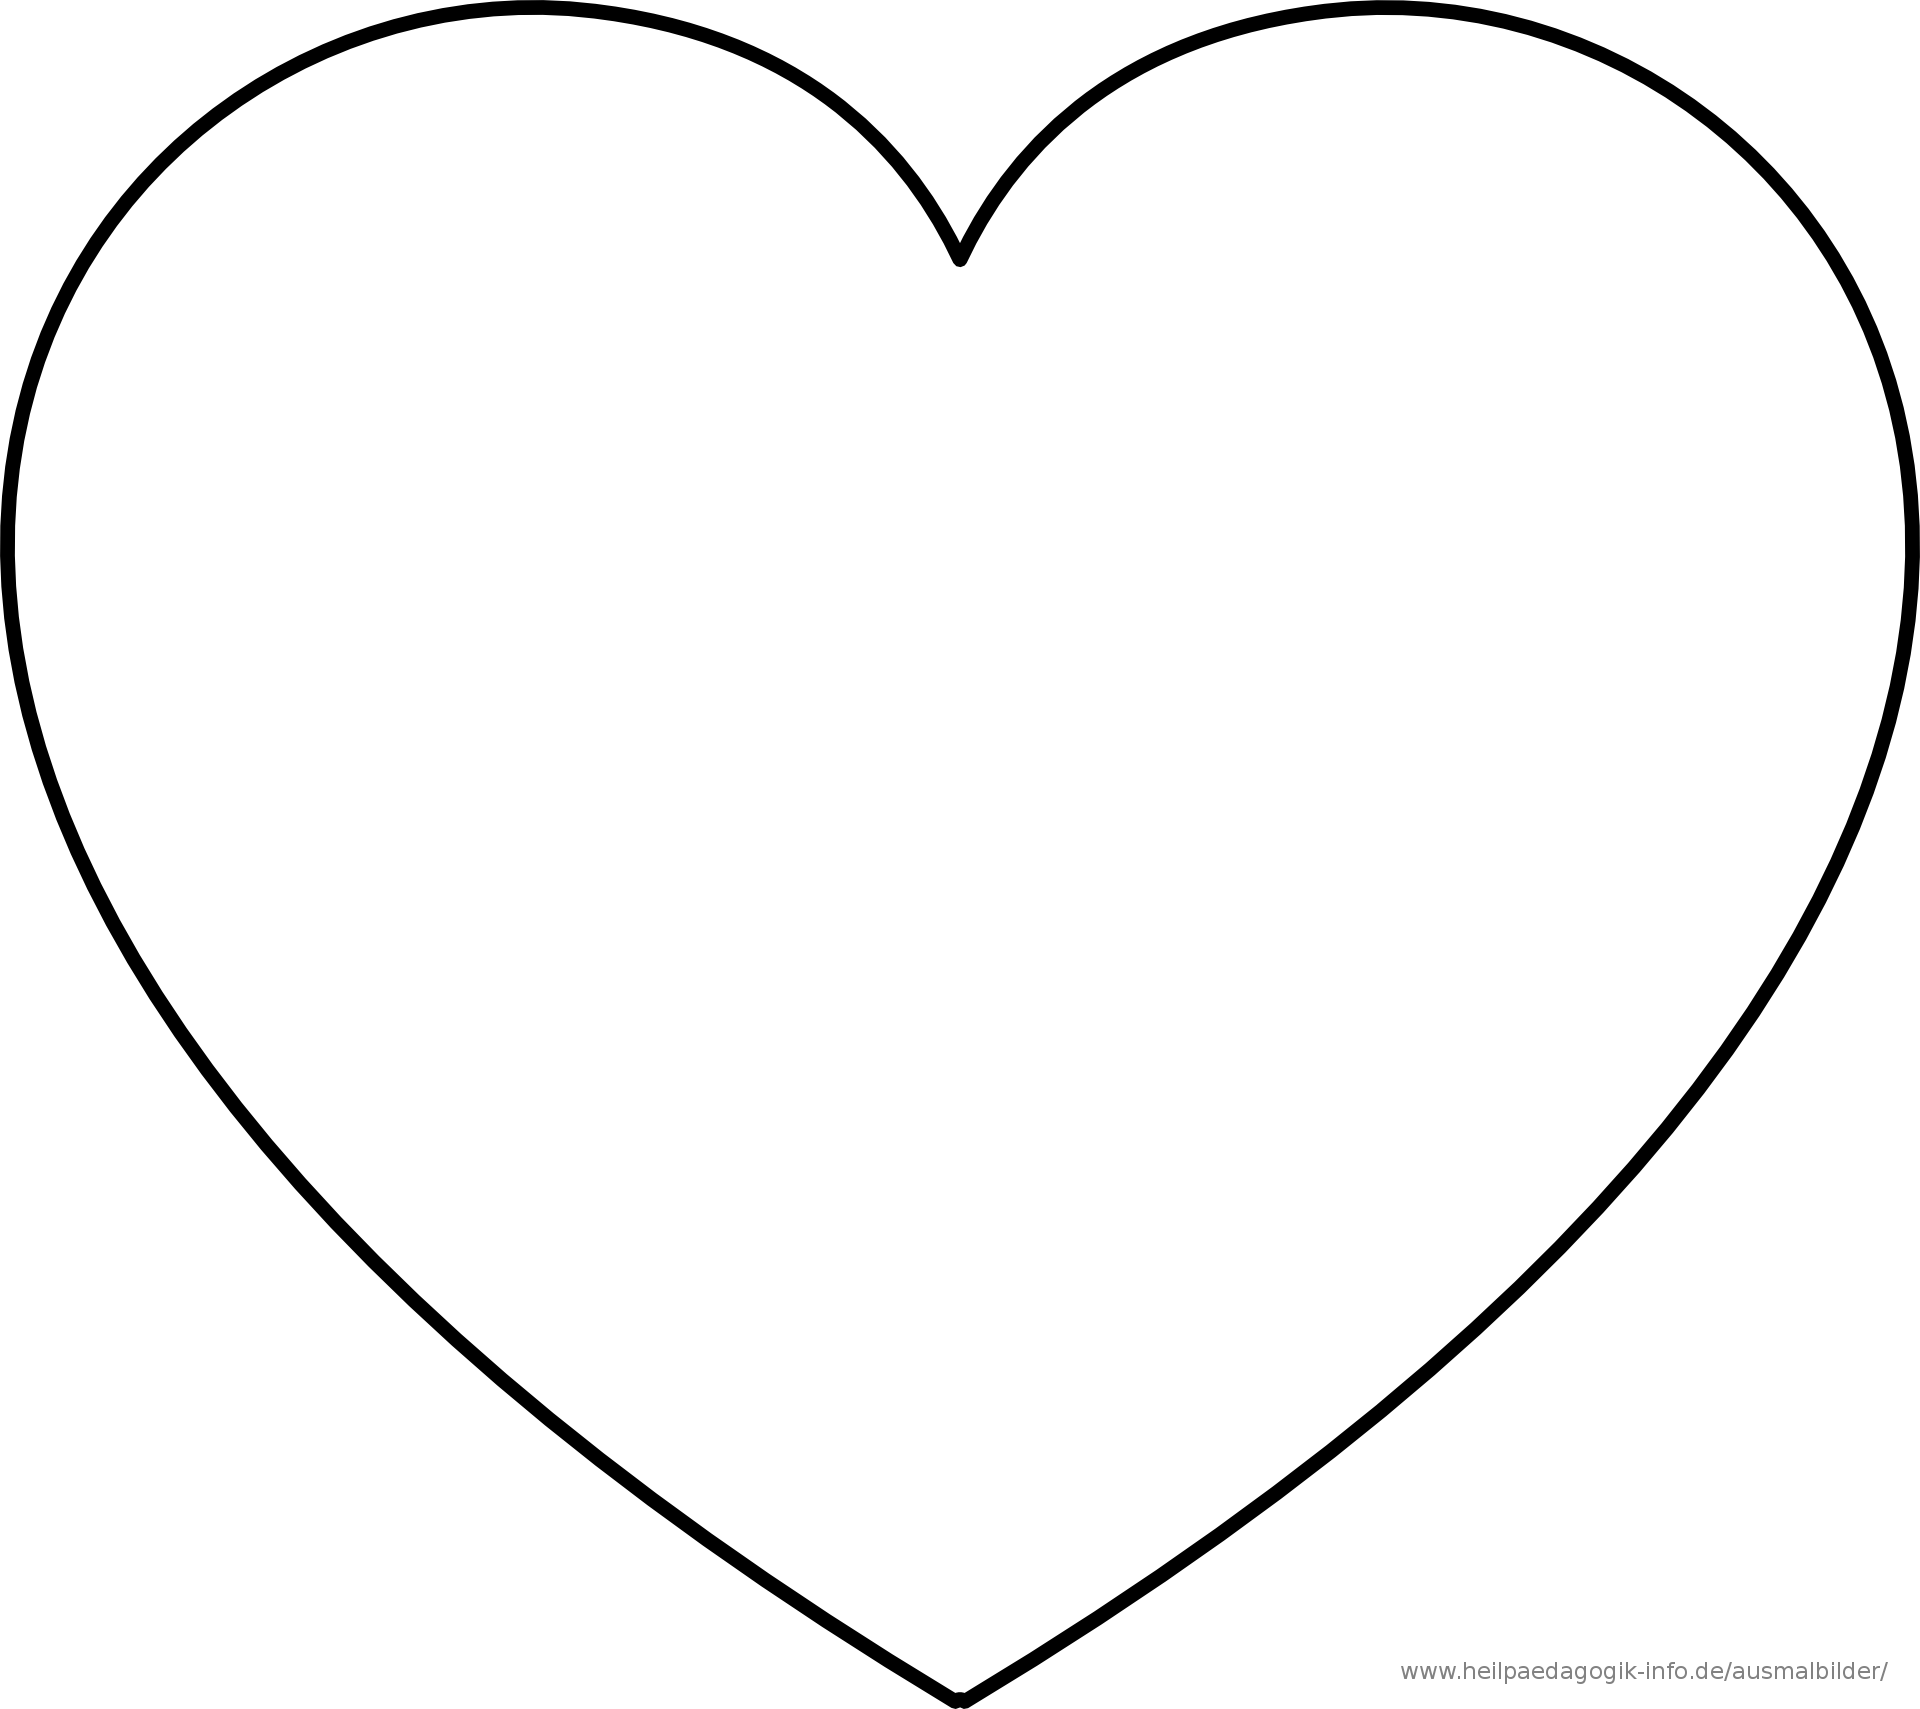 Liebe – Wikipedia | Clipart kostenlos, Vorlagen, Filofaxing